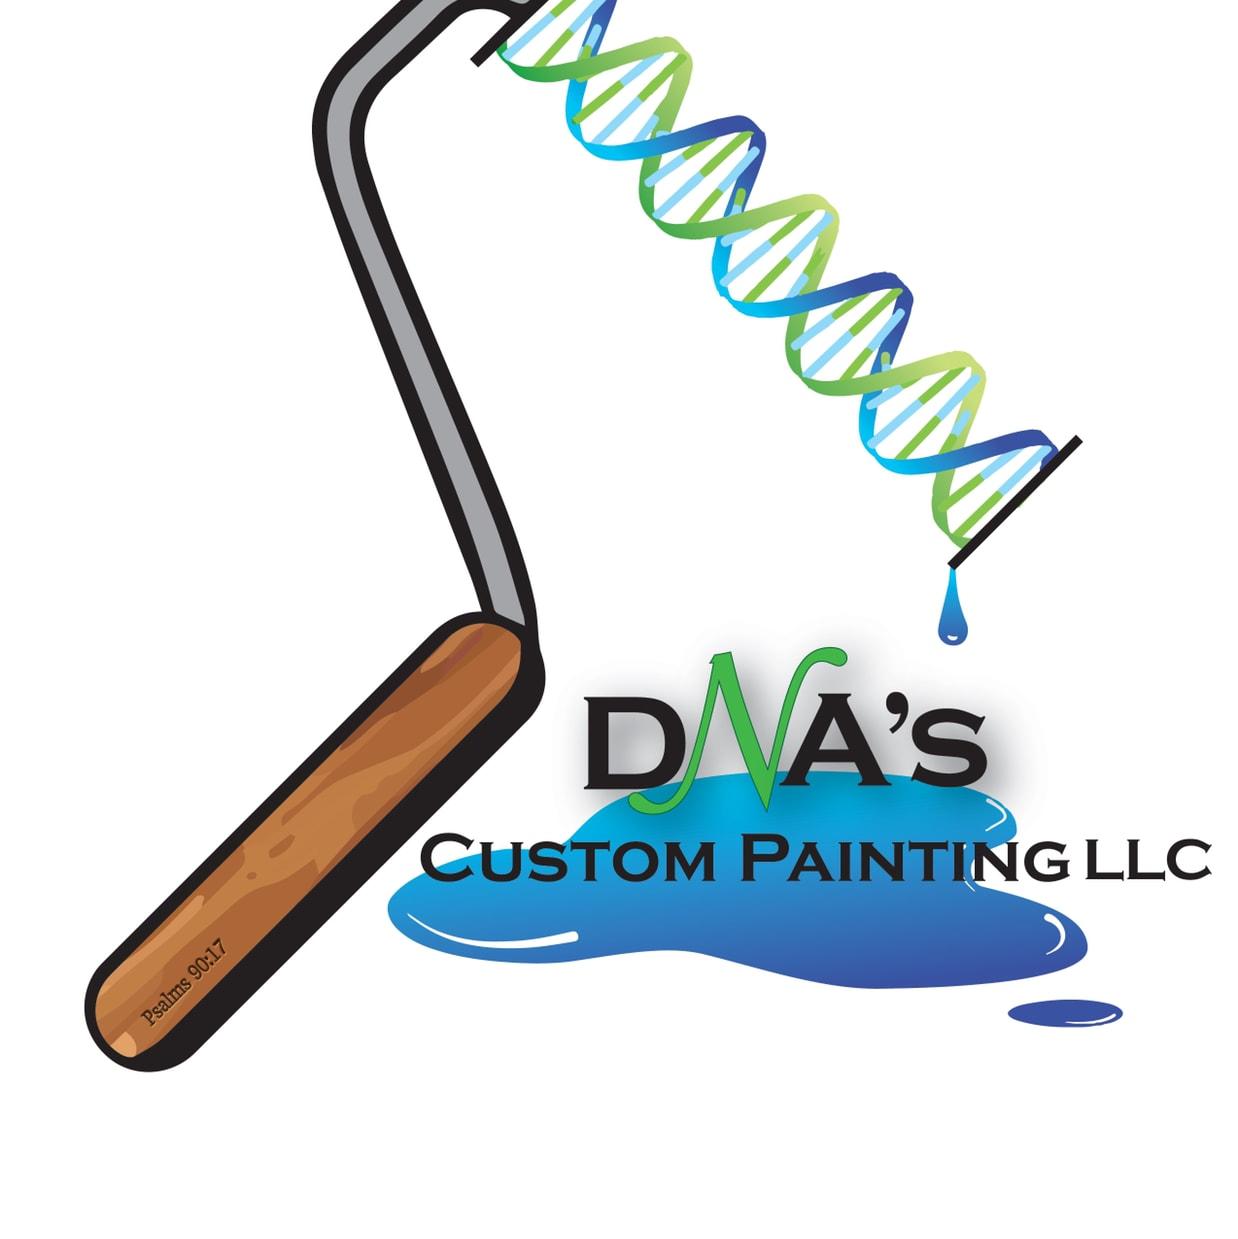 D.N.A's Custom Painting LLC